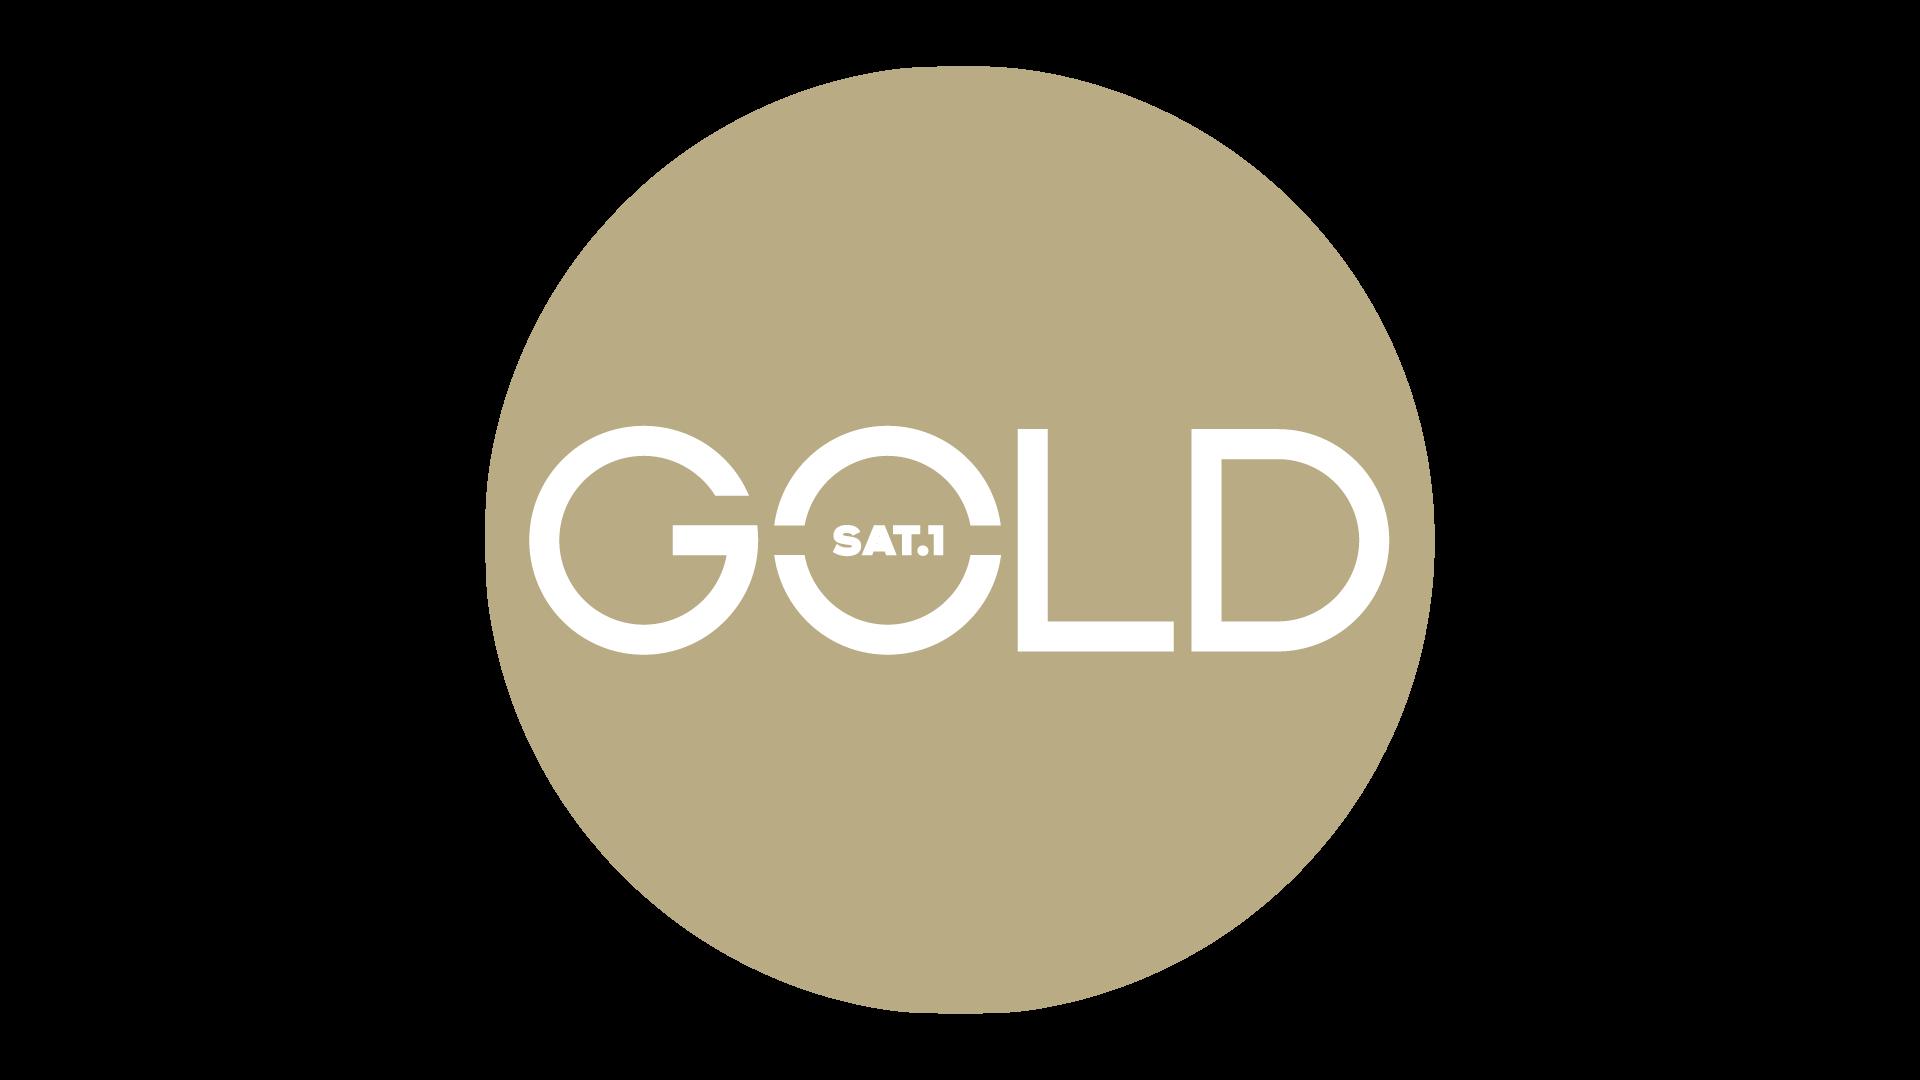 Sat 1 Gold Live